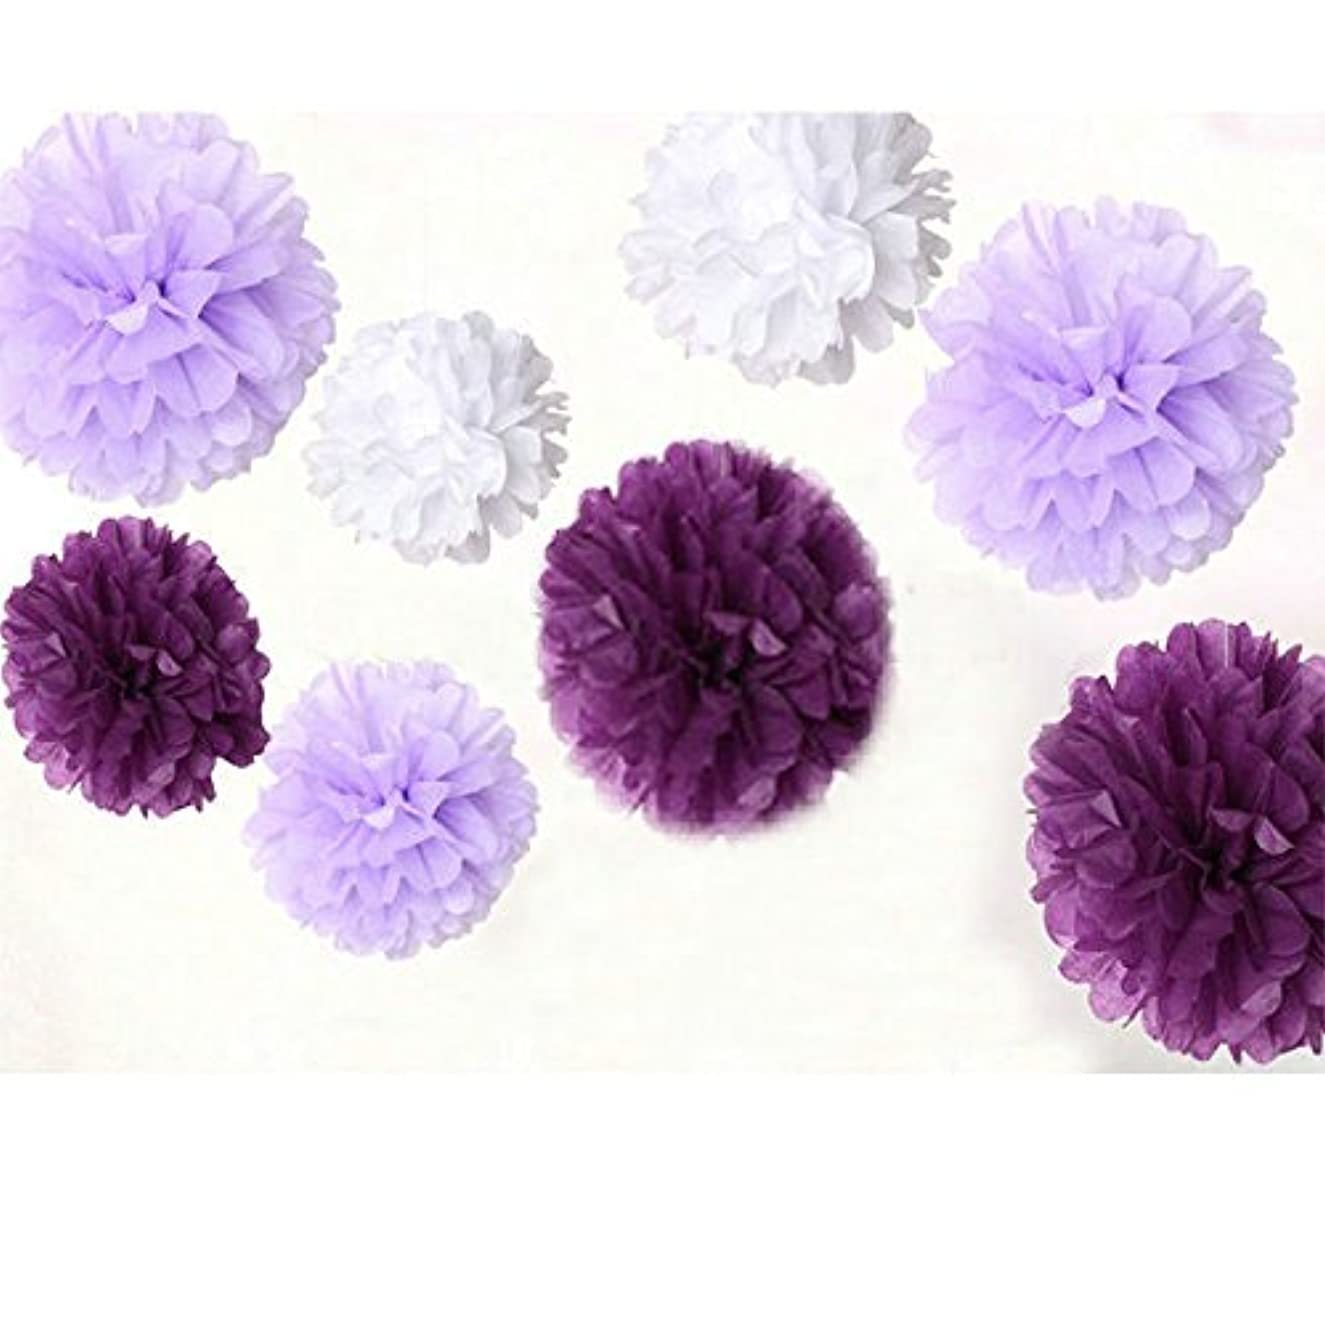 Krismile? Pack of 18pcs Mixed 3 Sizes White Plum Lavender Tissue Paper Pom Pom Flower Holiday Wdding Party Garland Baby Girl Room Decoration